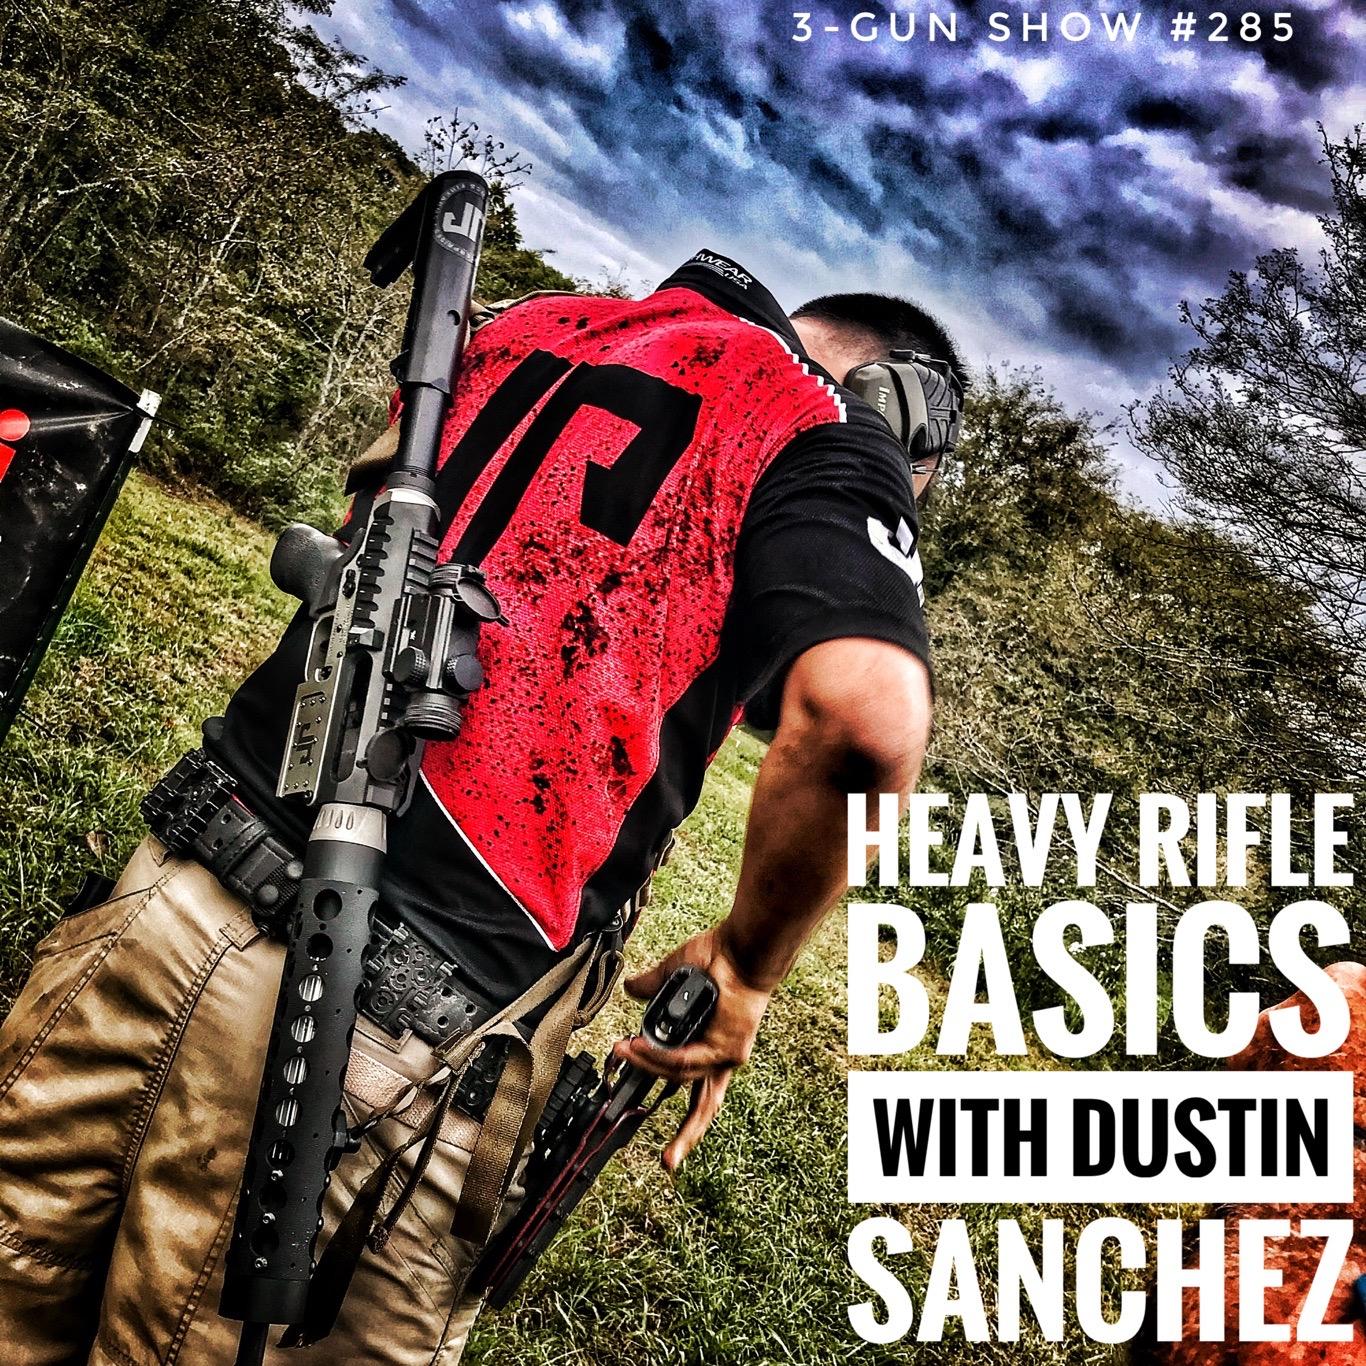 Heavy Rifle Basics With Dustin Sanchez